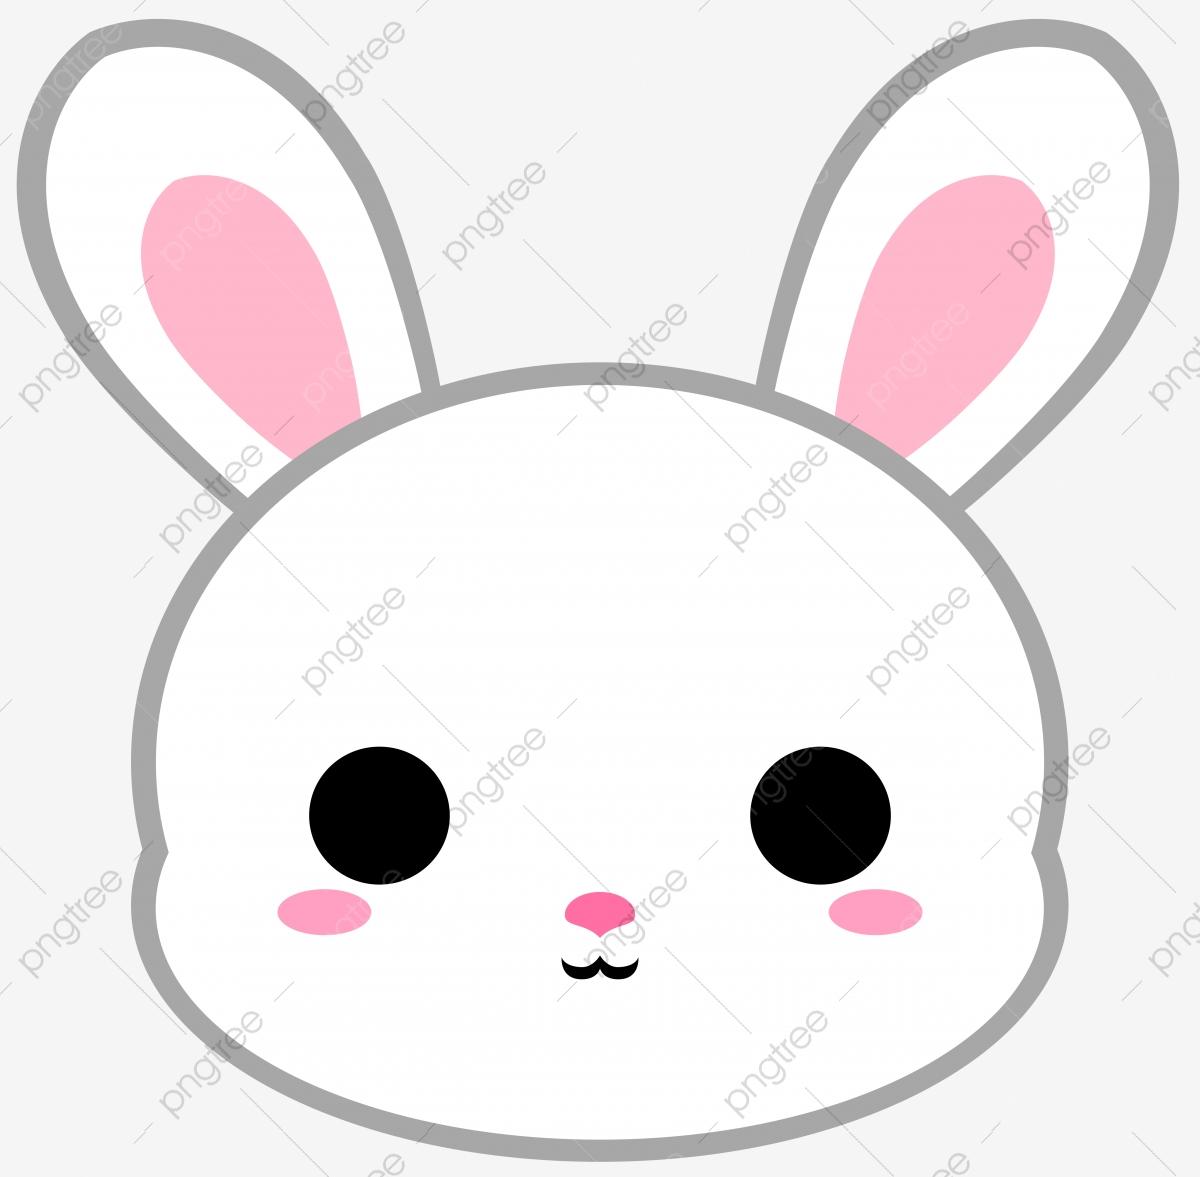 Bunnies clipart head. Cartoon white bunny rabbit